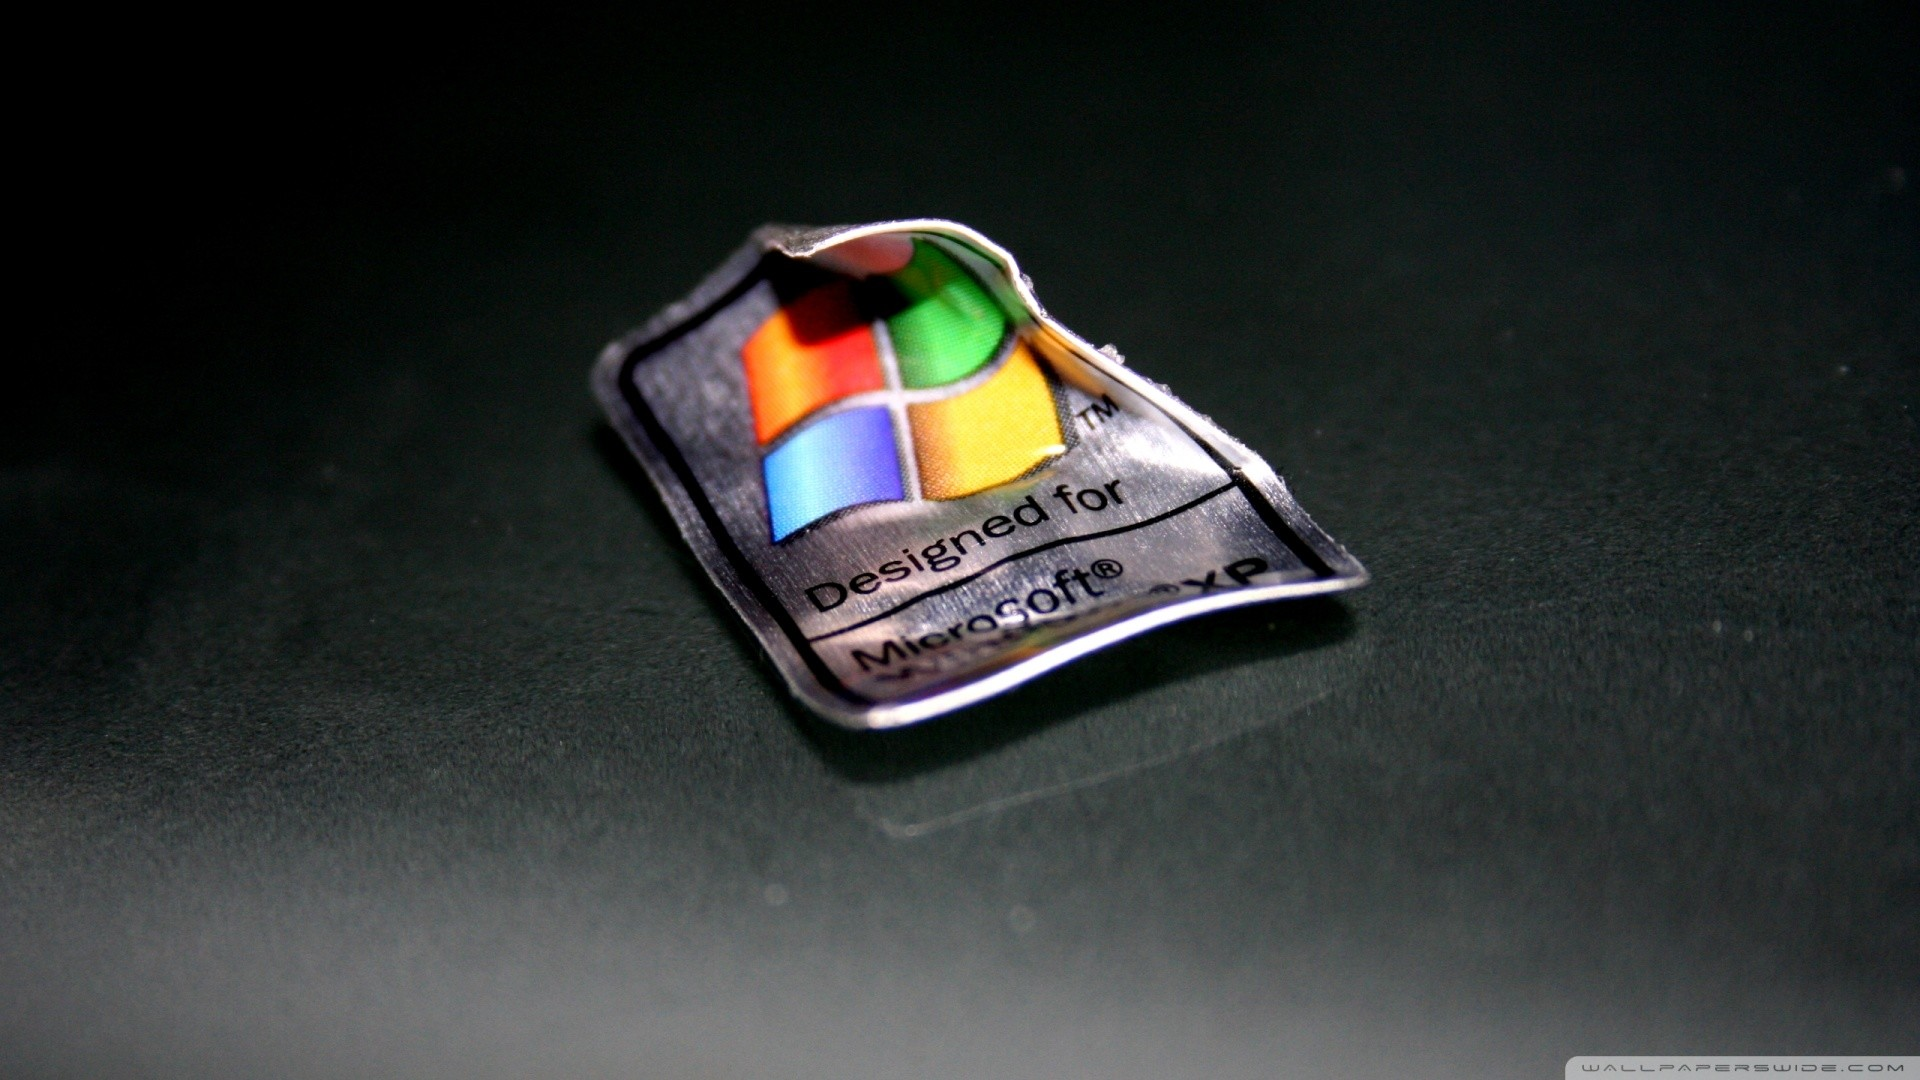 Microsoft Free Screensavers And Wallpaper Awesome Microsoft